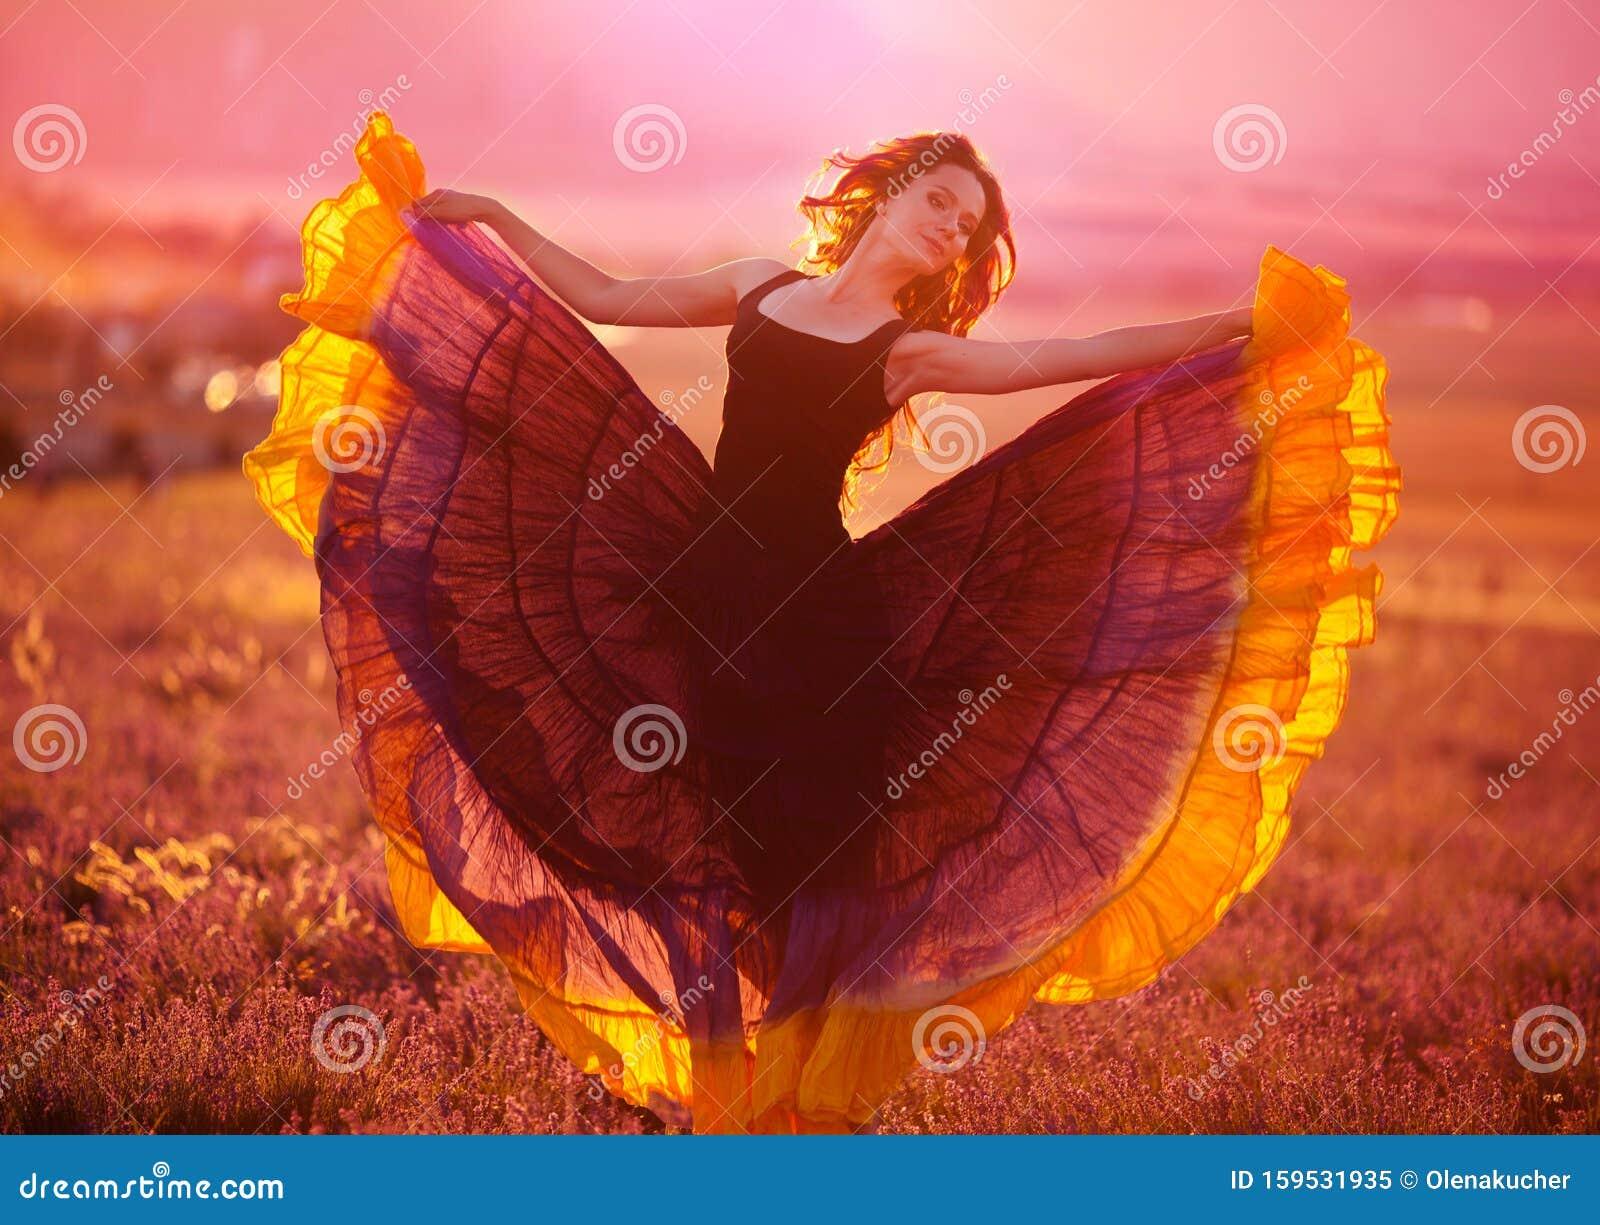 Young girl in a beautiful dress